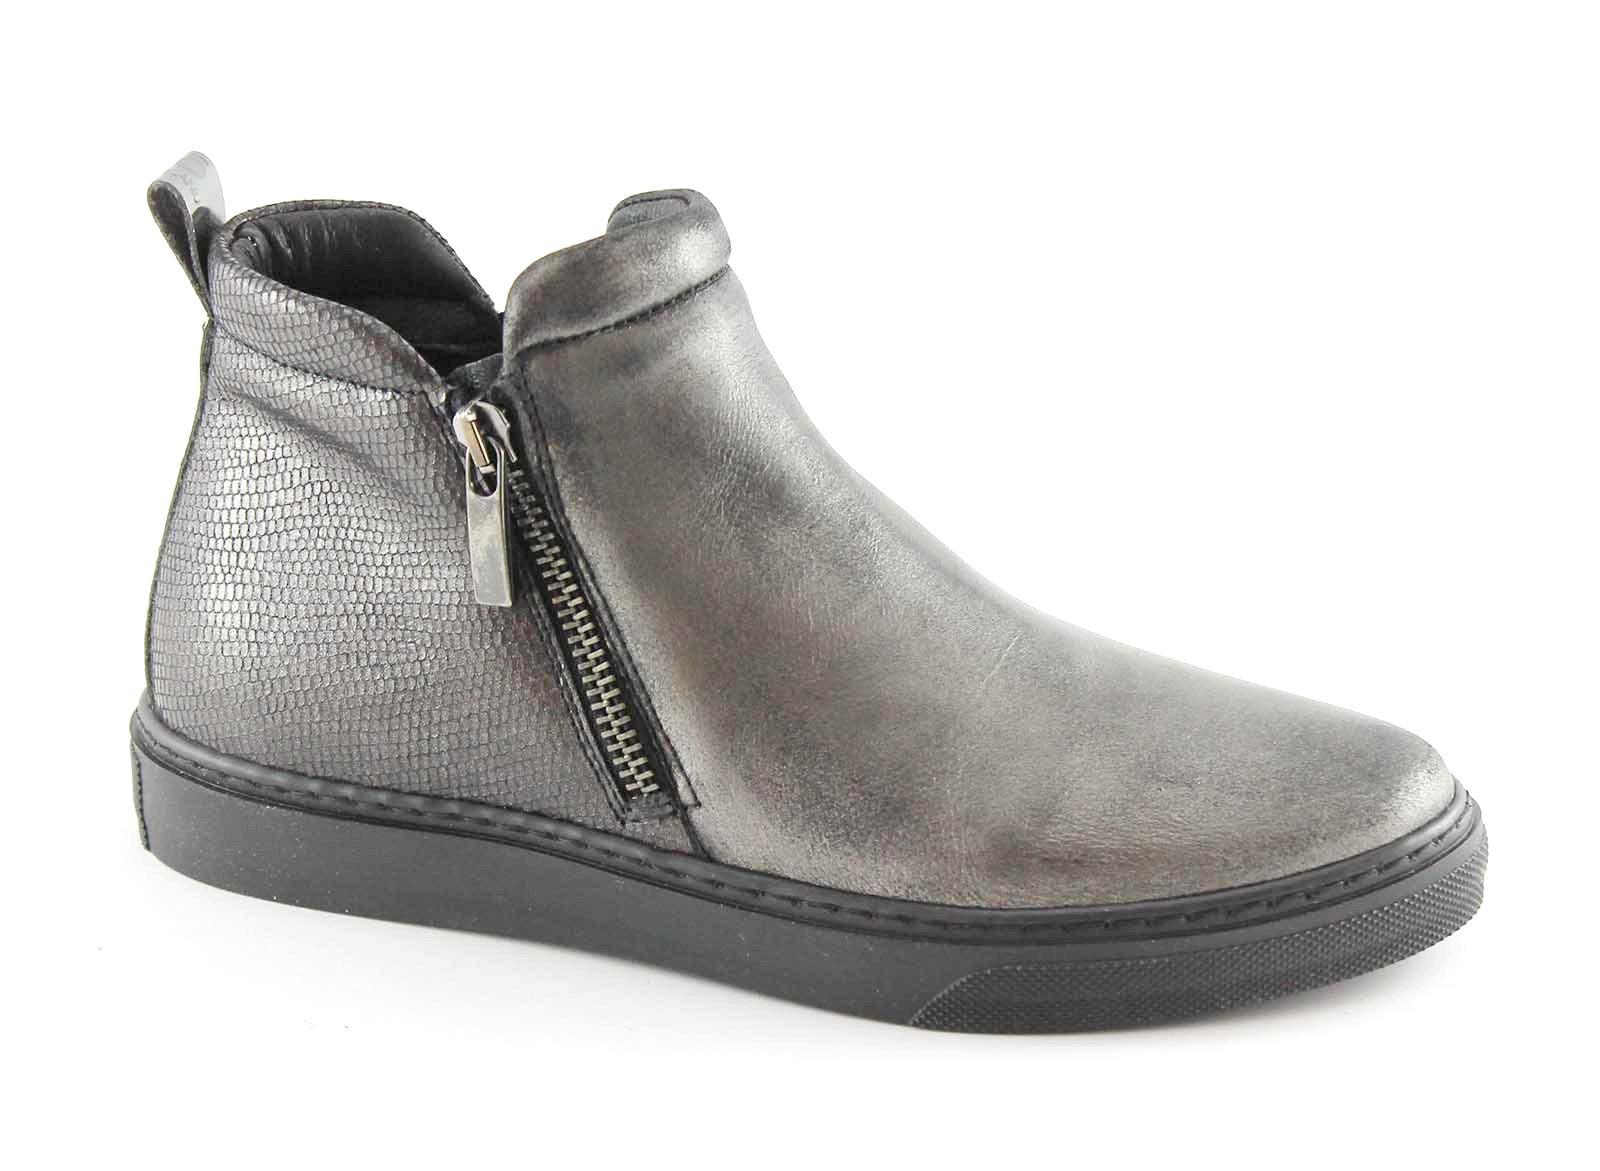 GRUNLAND PUNT PO0869 antracite scarpe platform donna mid cerniera elastico platform scarpe 5333c5